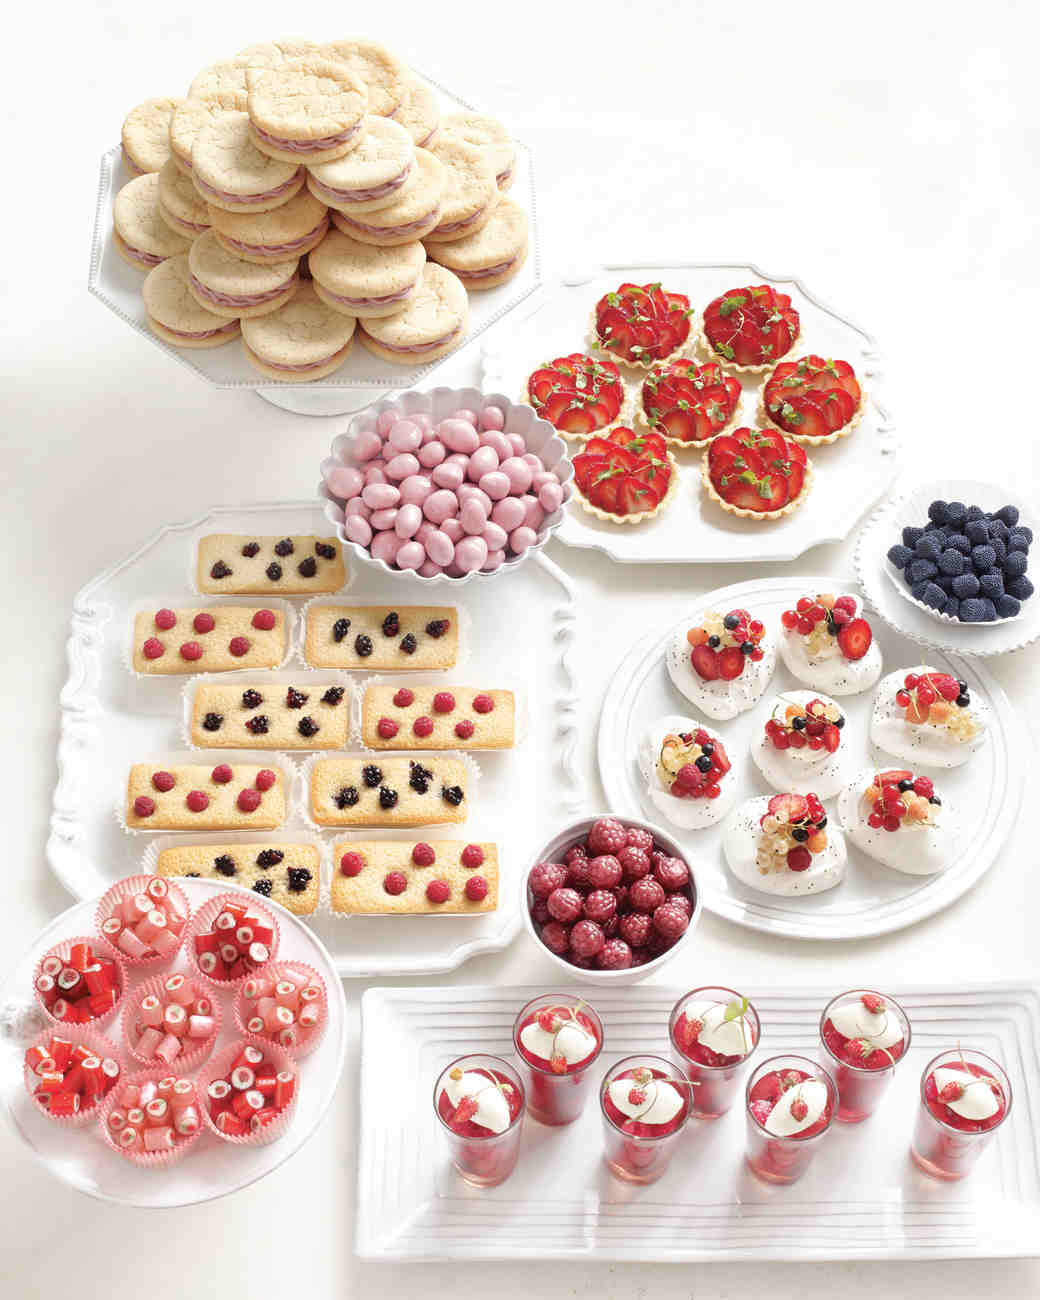 berry-deserts-mwd107768.jpg